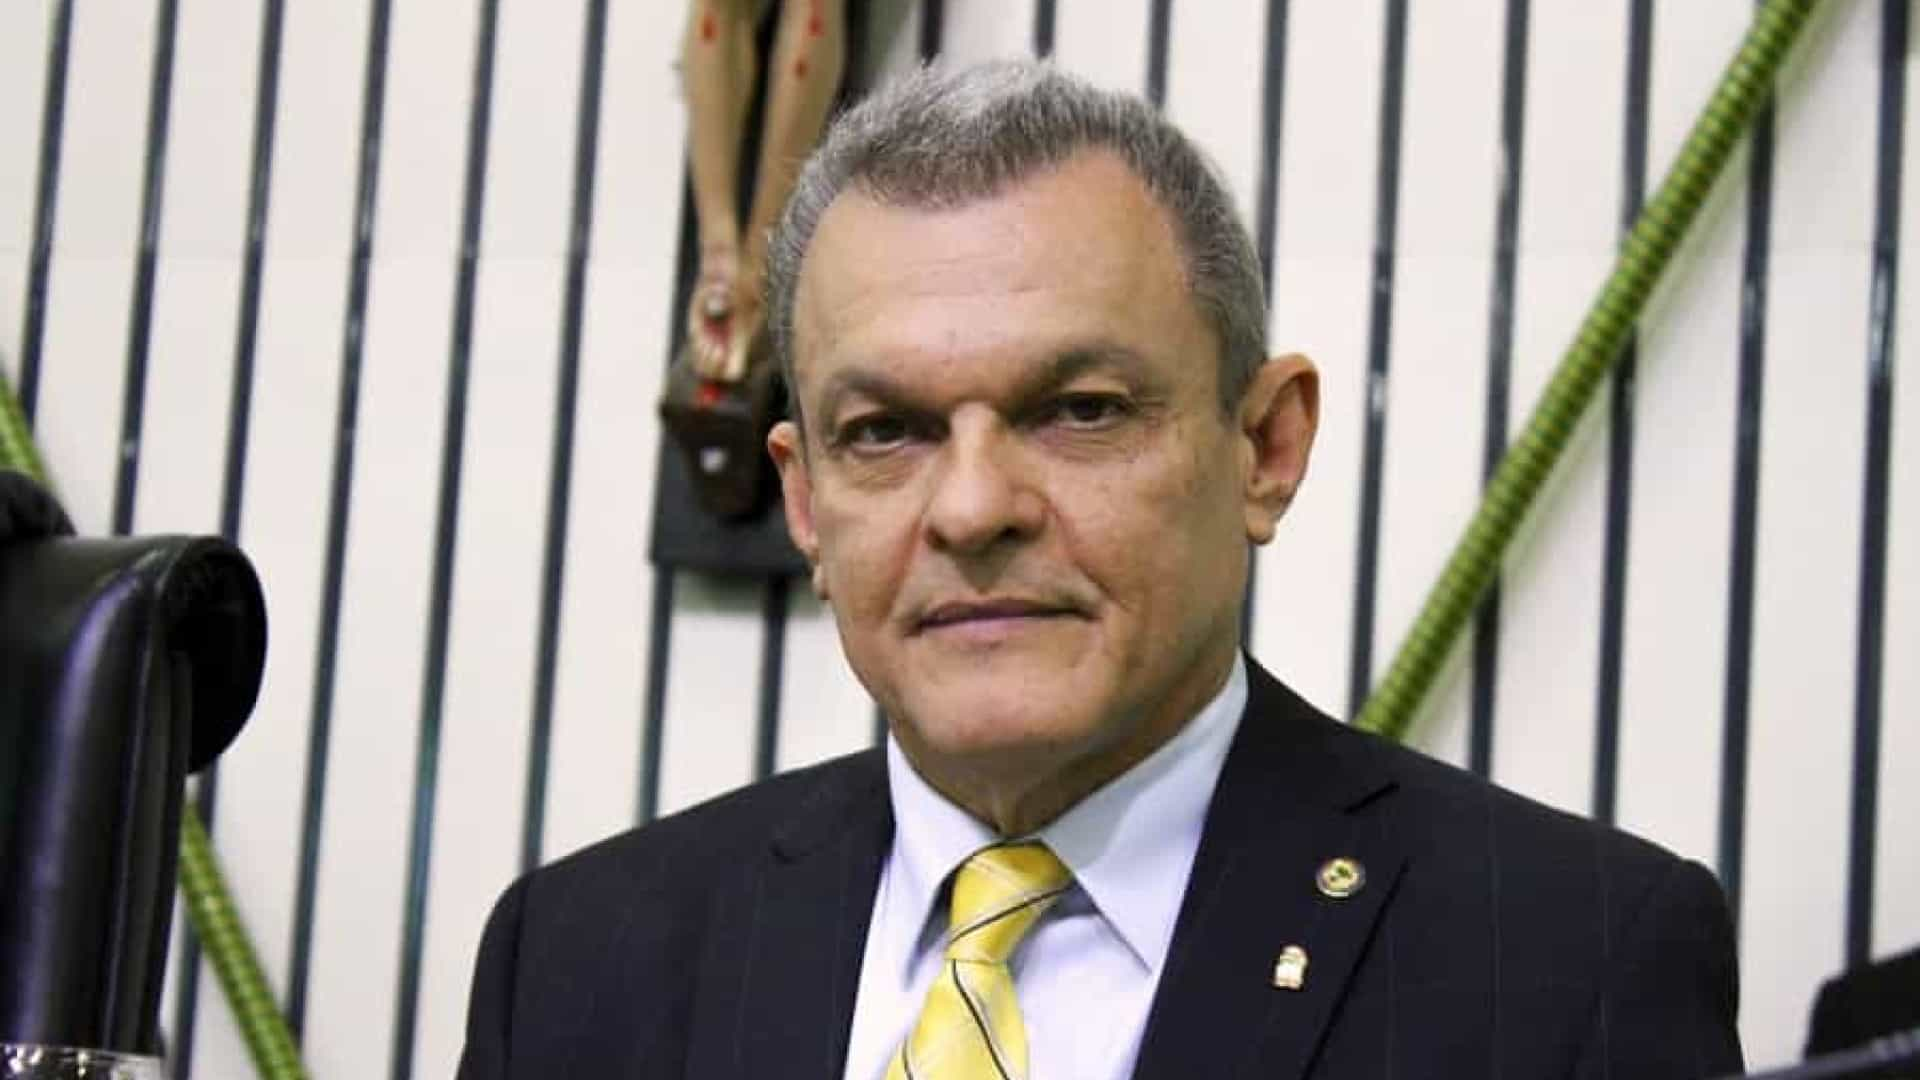 José Sarto (PDT) vota em Fortaleza e repete discurso de 'defesa da democracia'